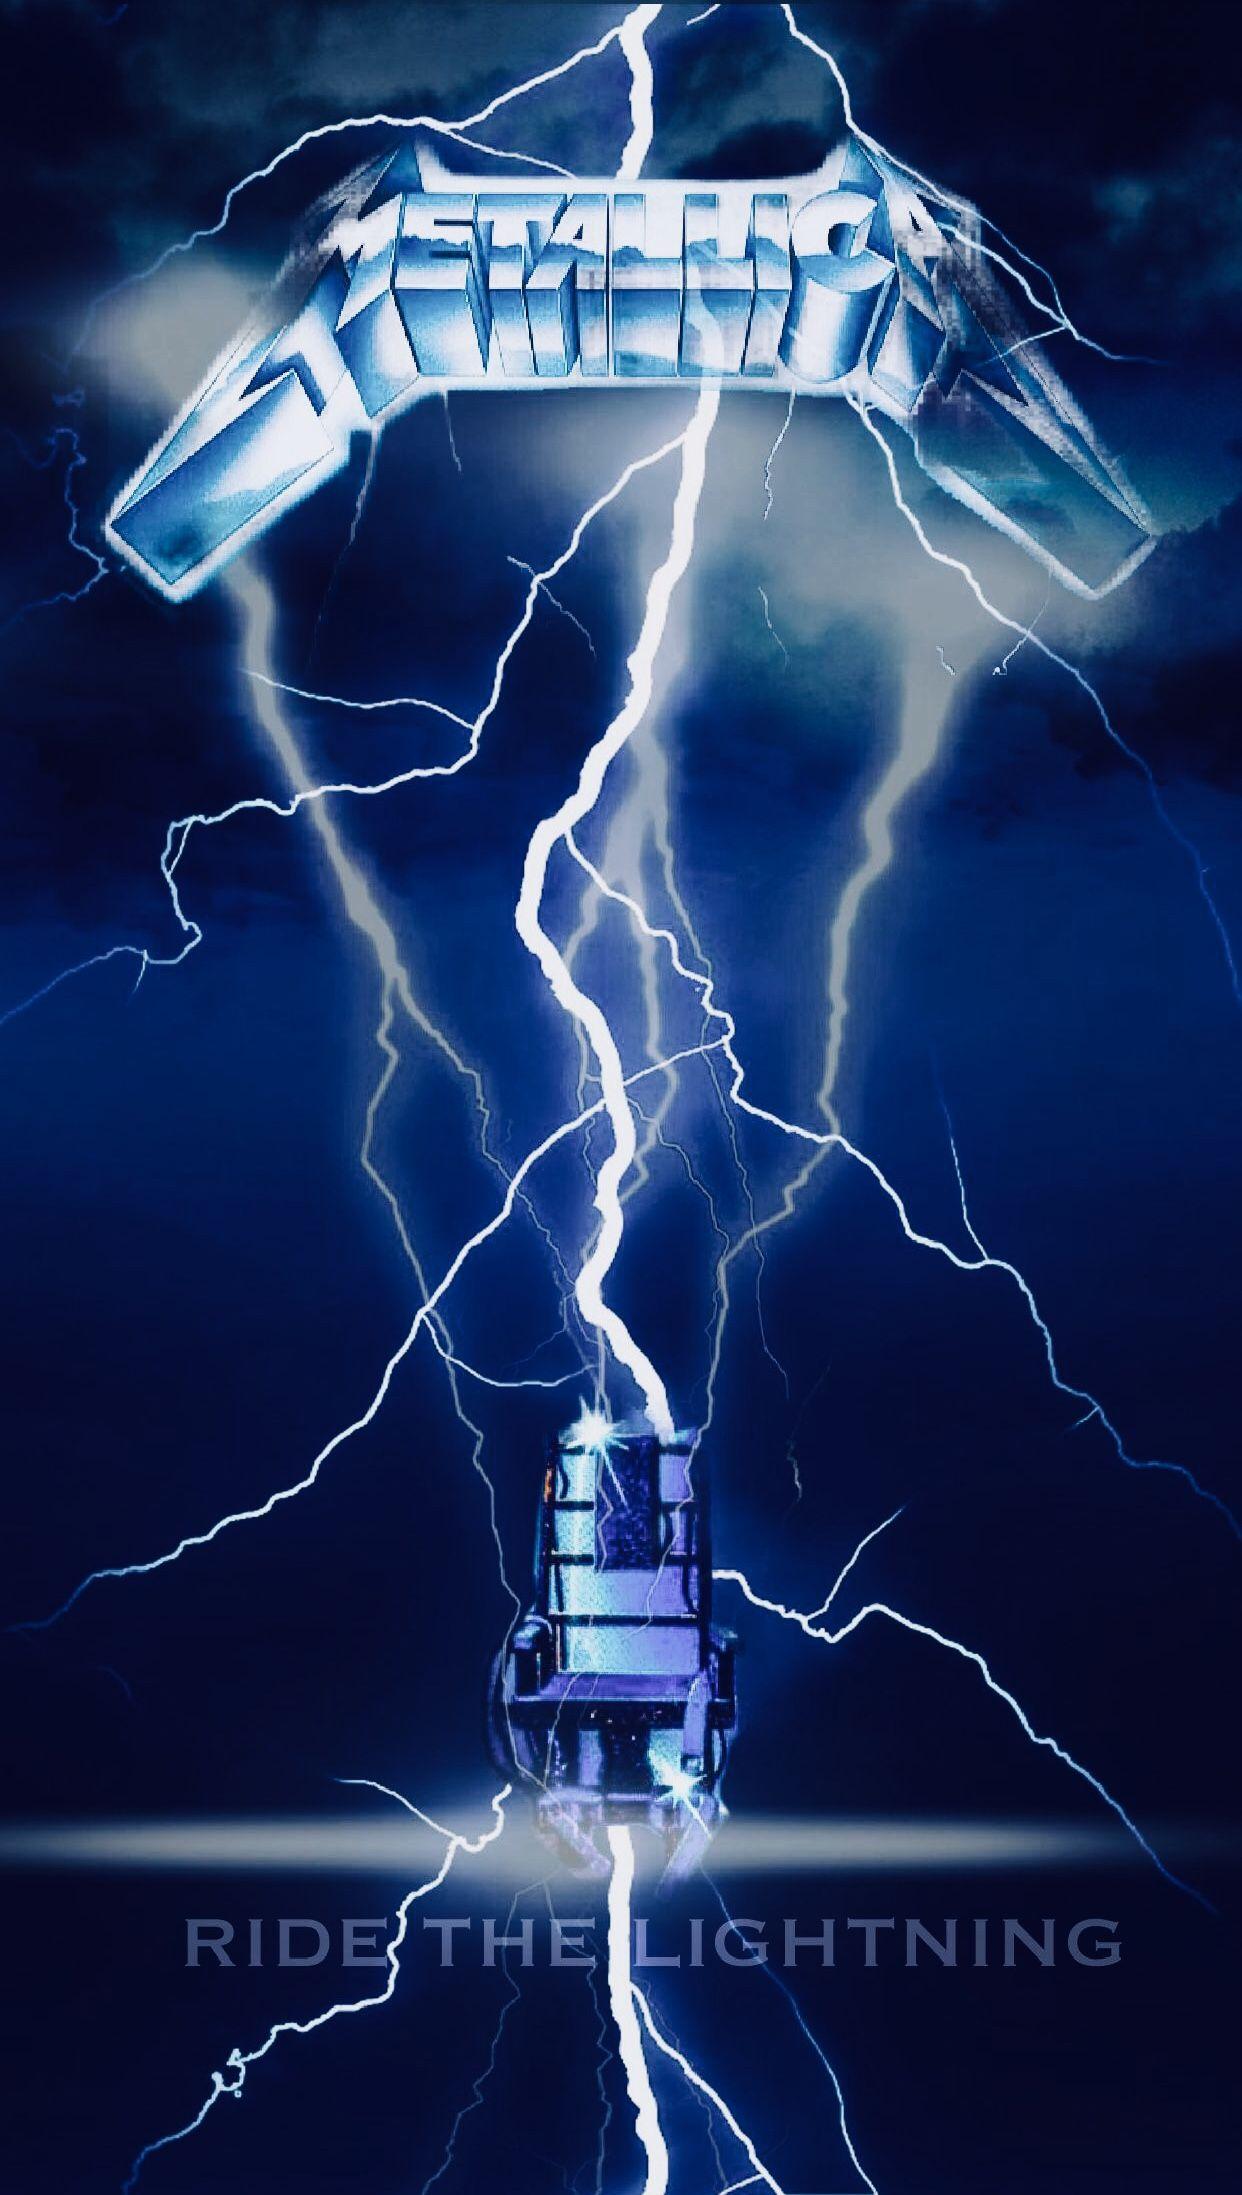 Ride The Lightning Metallica FanArt Album Cover Made by ...